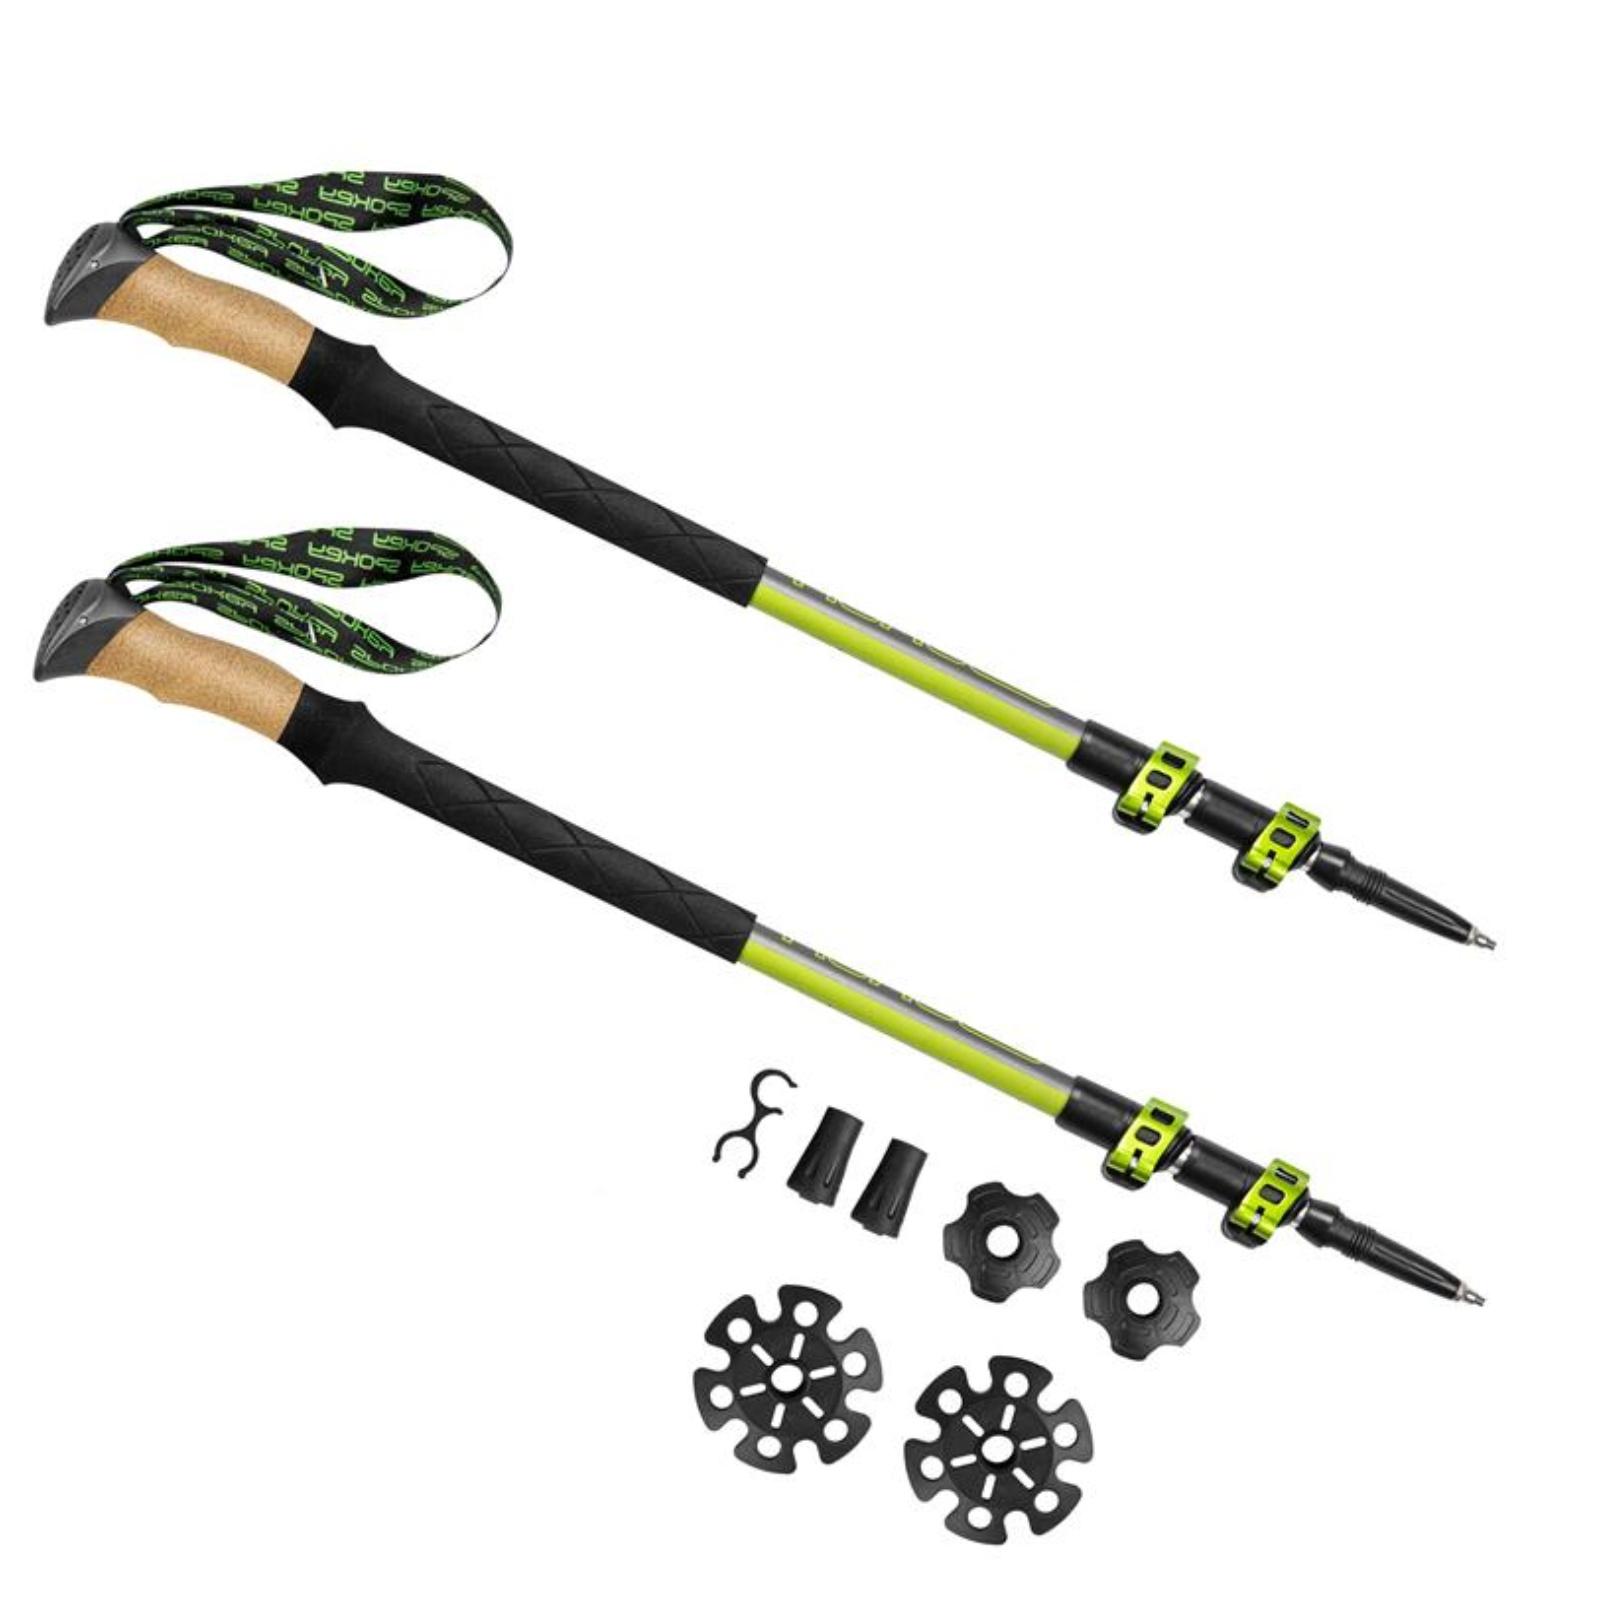 Trekingové palice SPOKEY Compass zeleno - strieborné